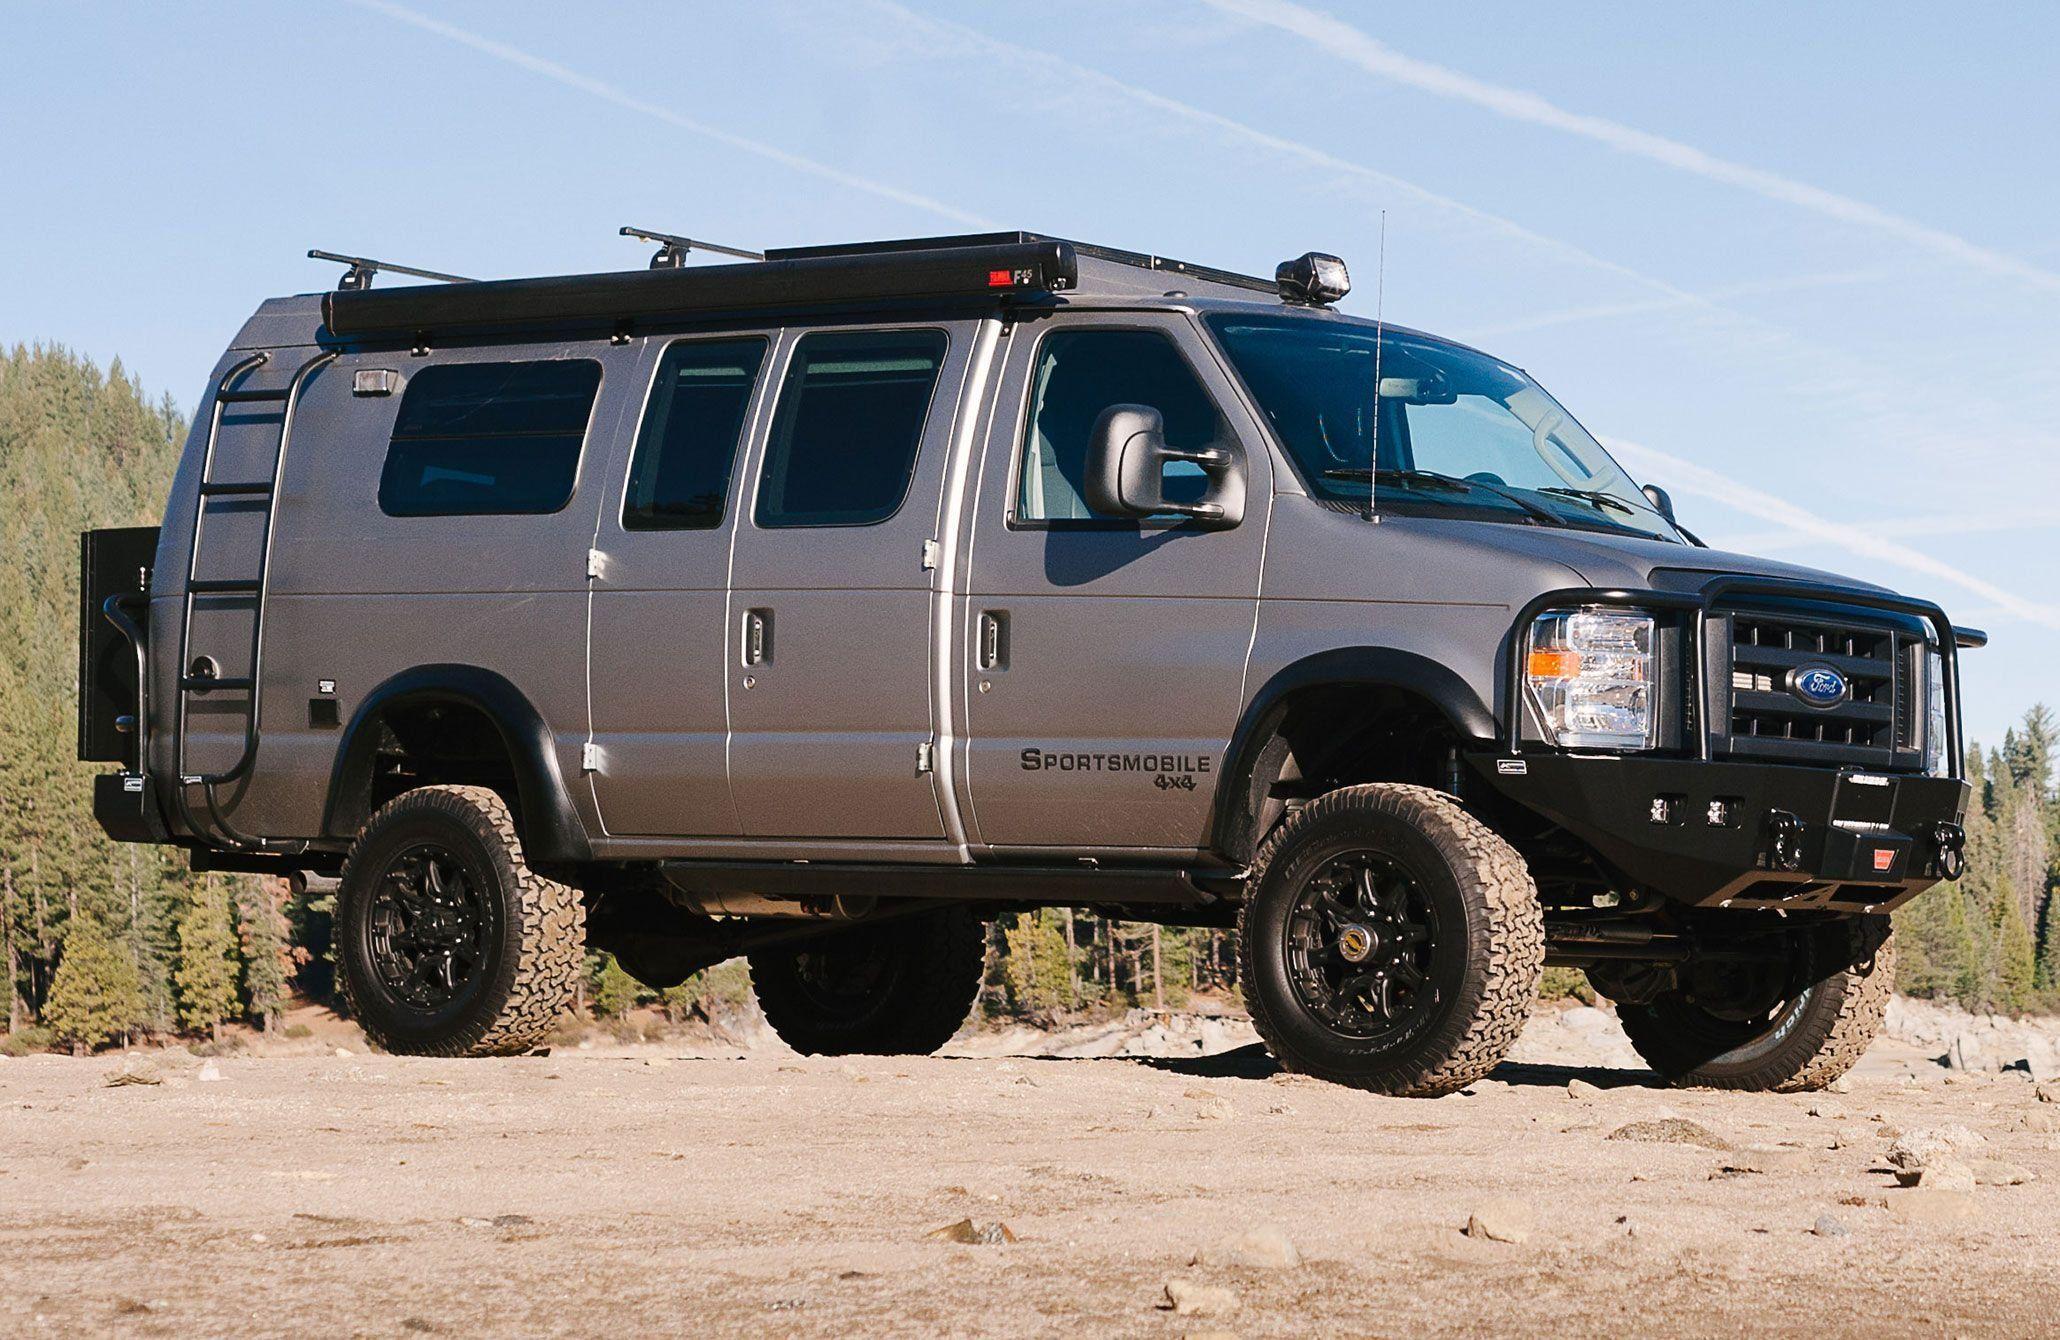 2015 sportsmobile ford e 350 van camper motorhome 4x4 f350 wallpaper 2060x1340 859745